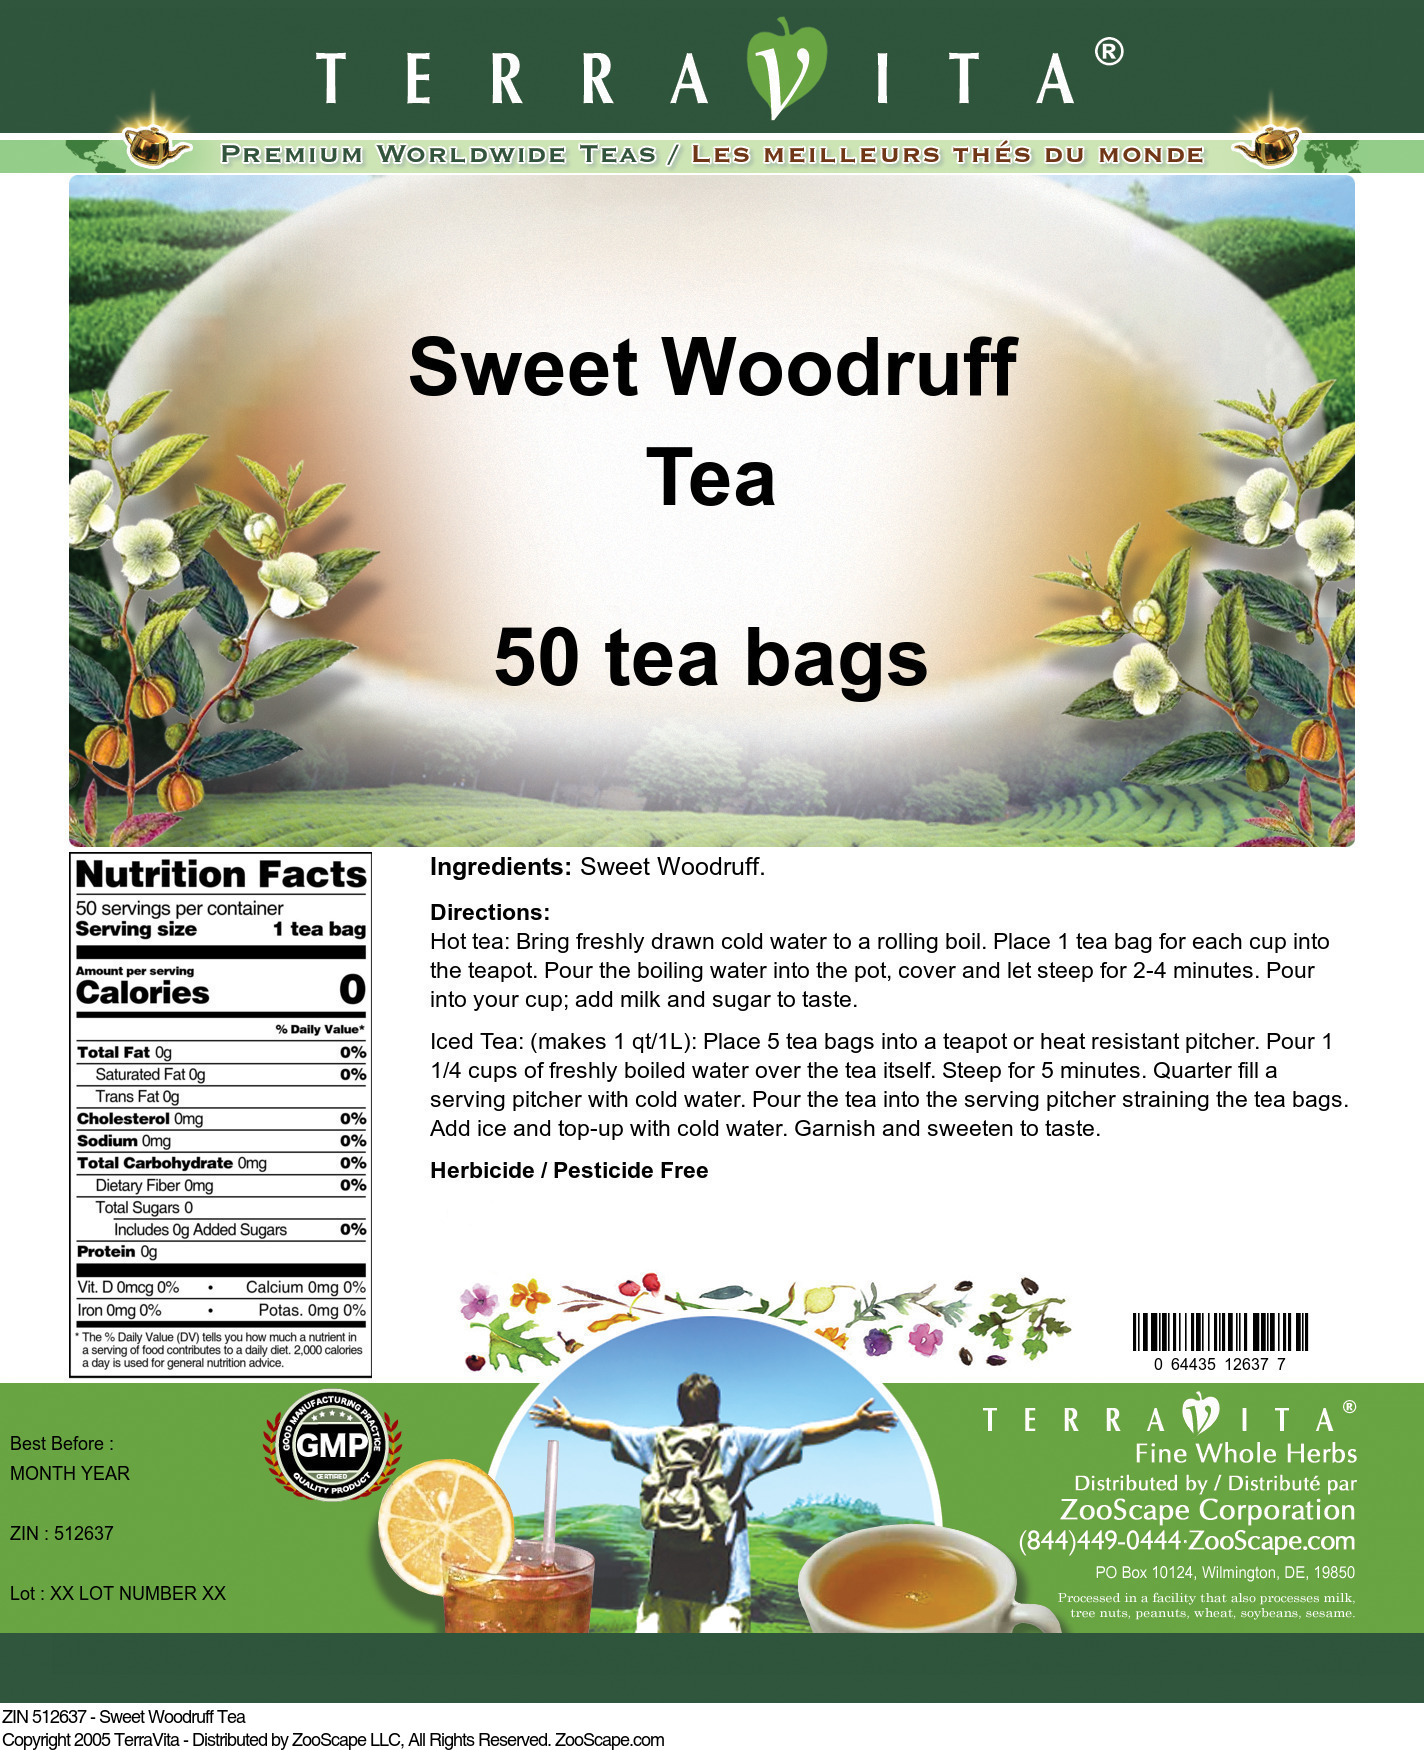 Sweet Woodruff Tea